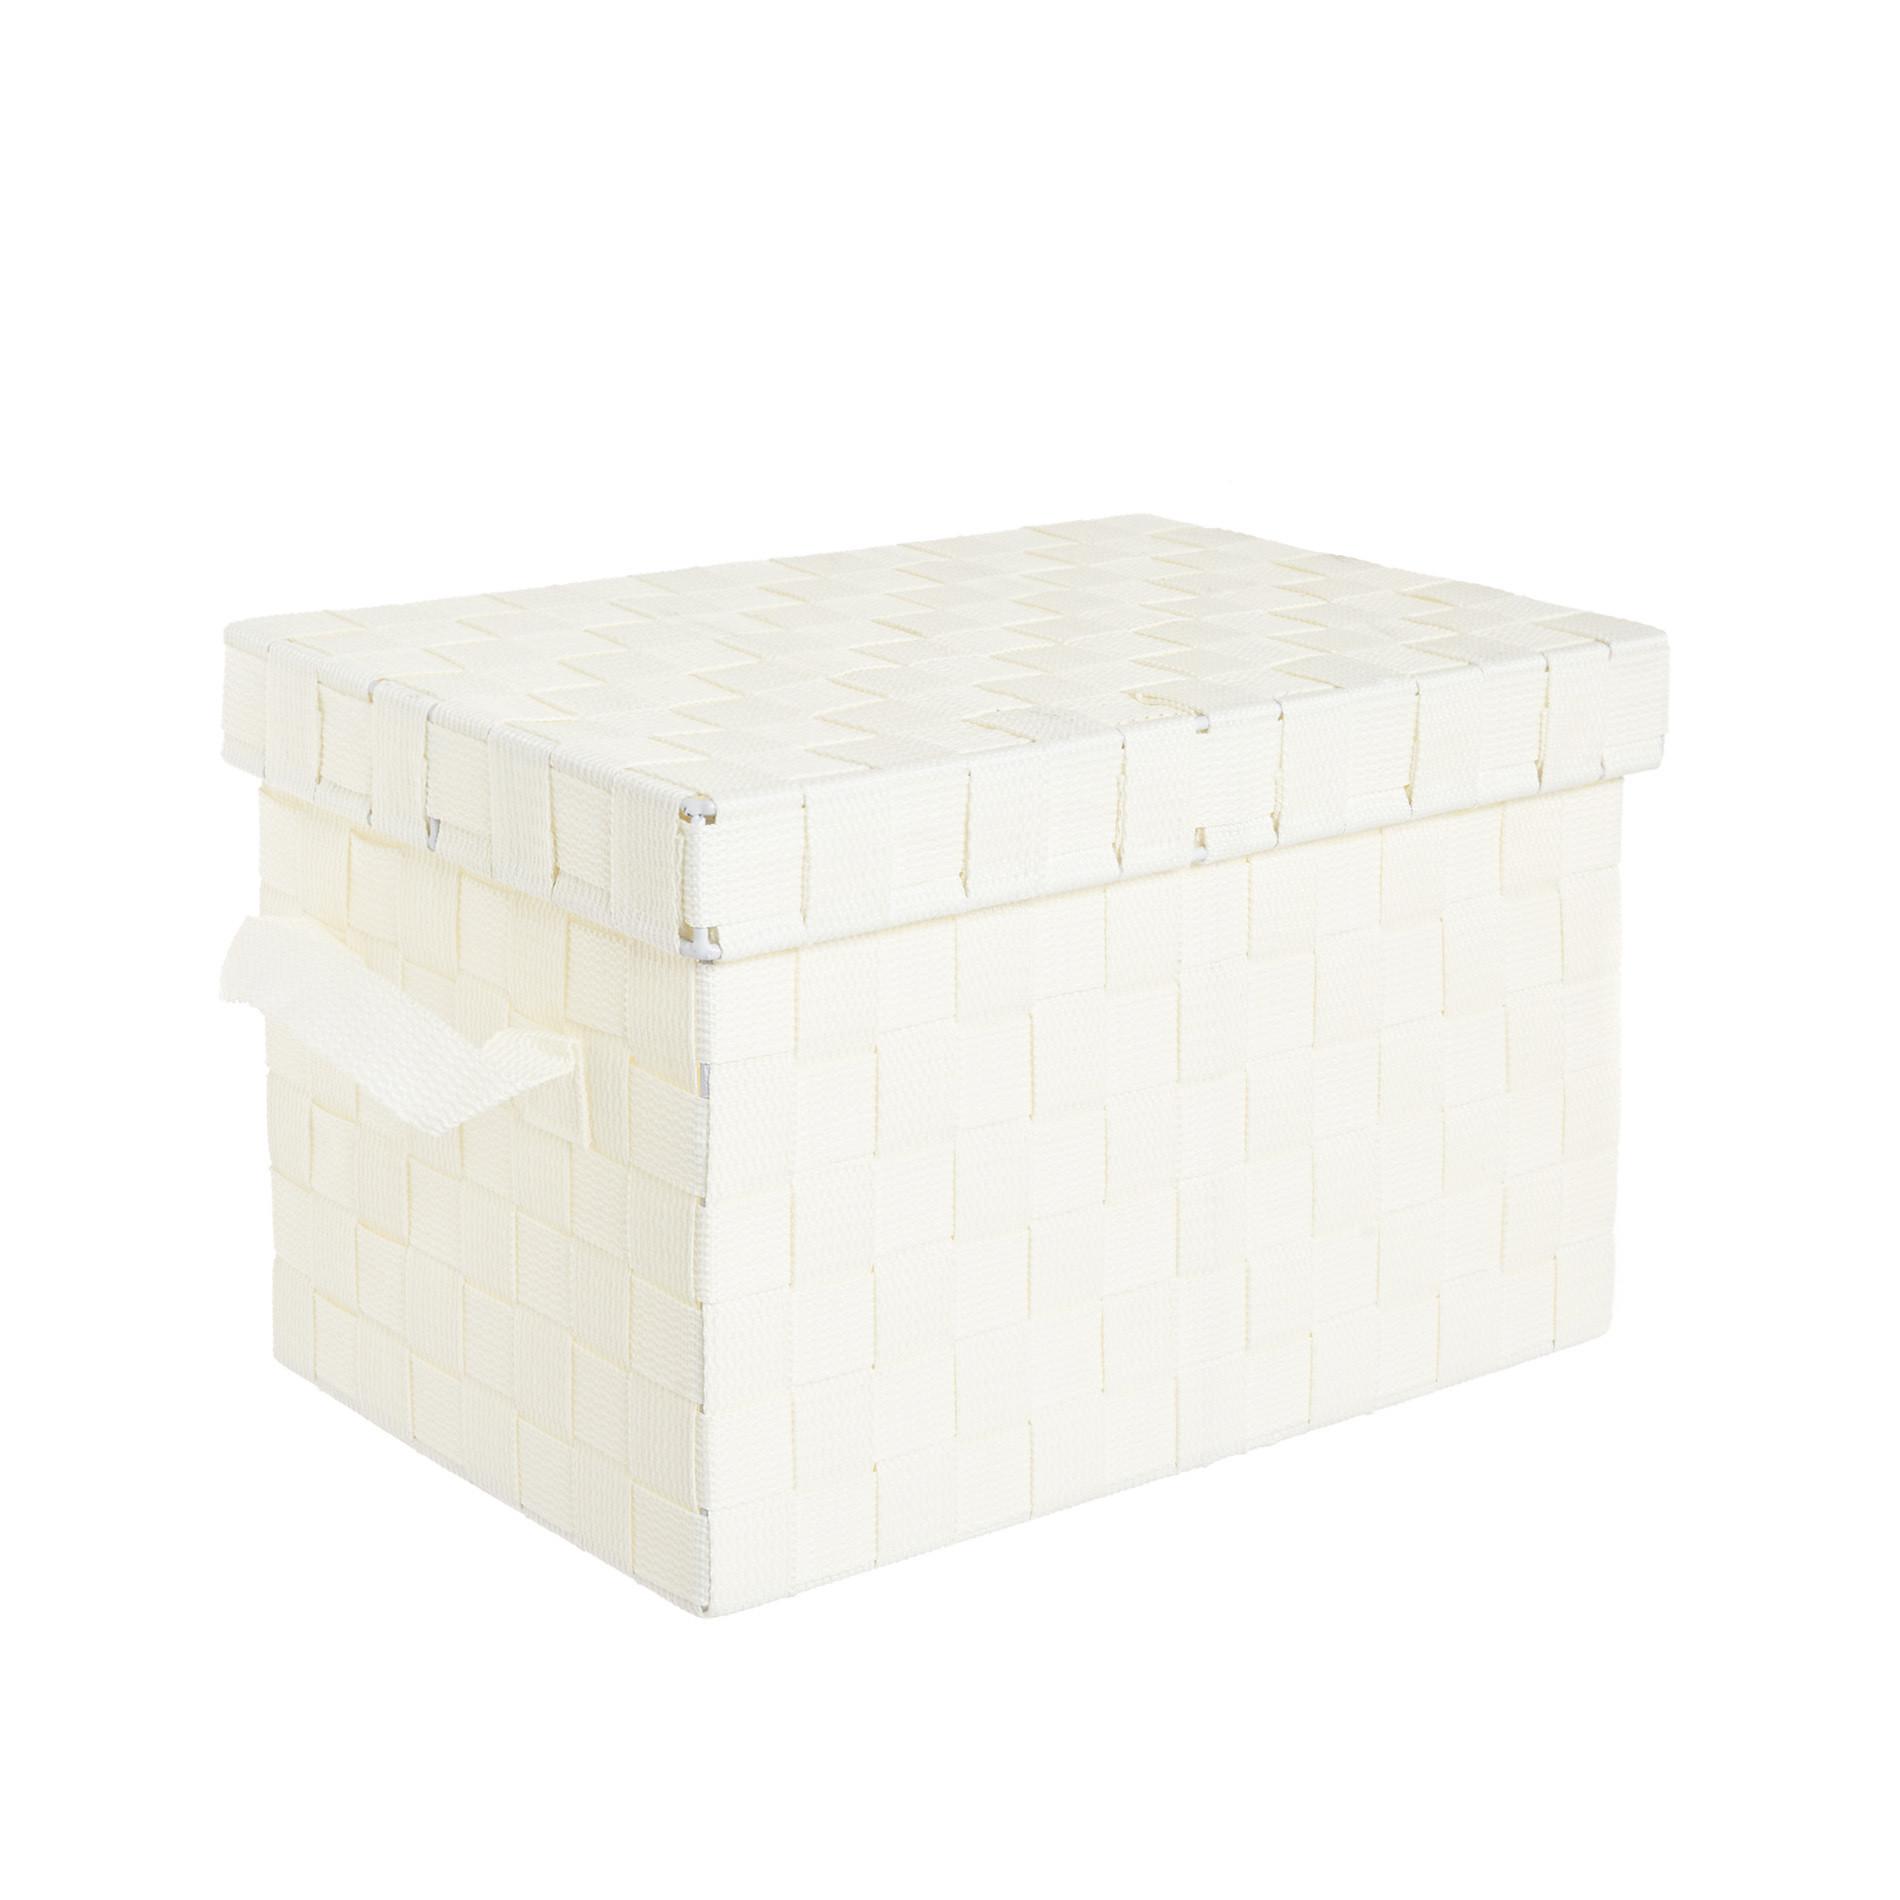 Storage box a nastri intrecciati, Bianco, large image number 0